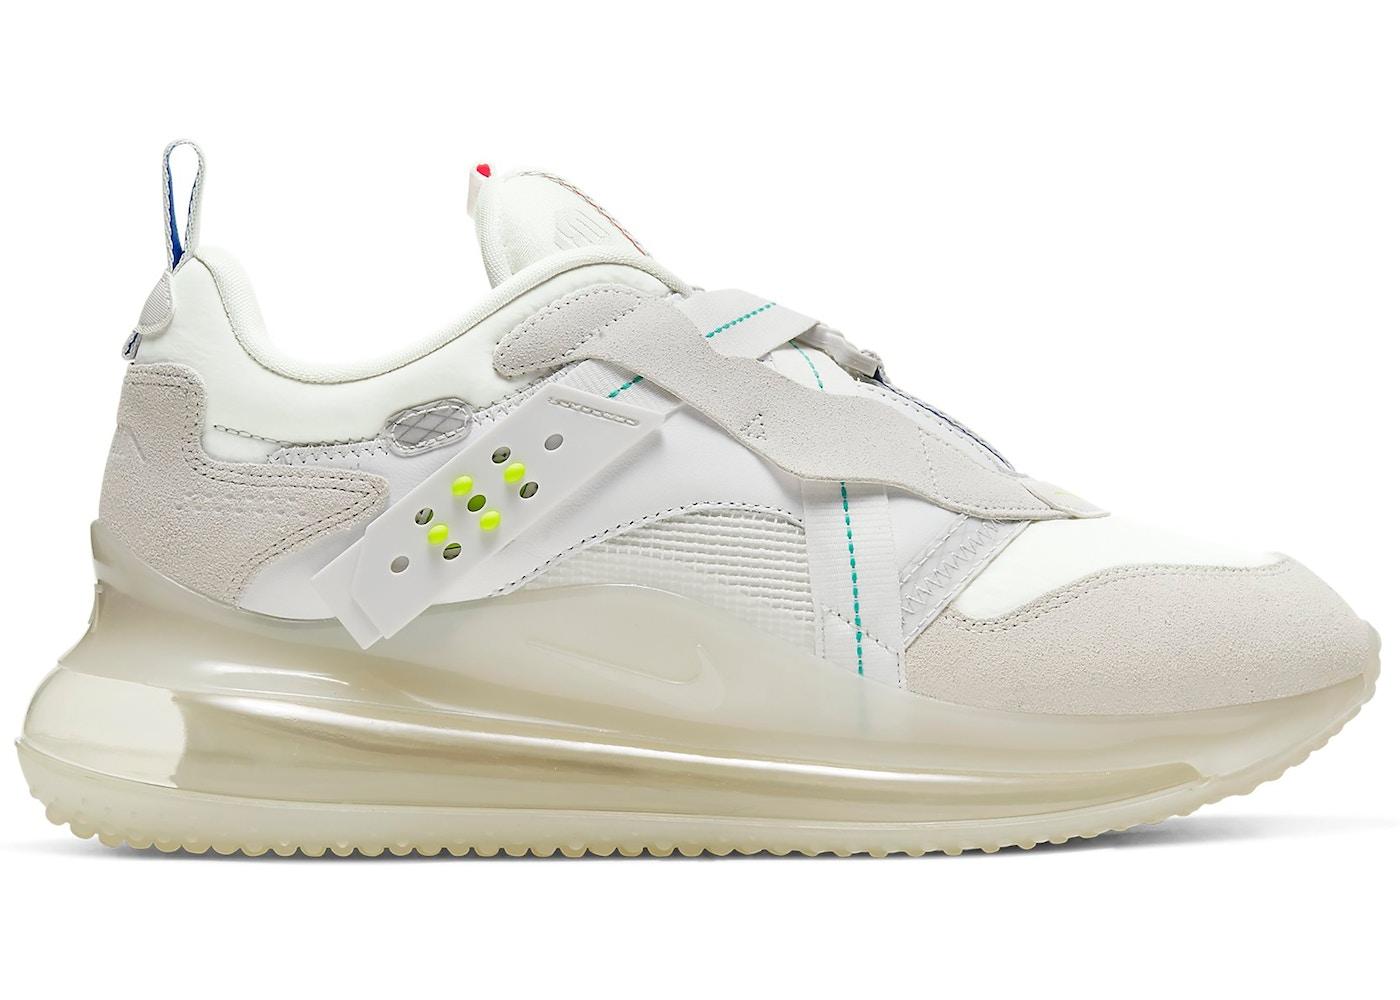 Nike Air Max 720 OBJ Slip White